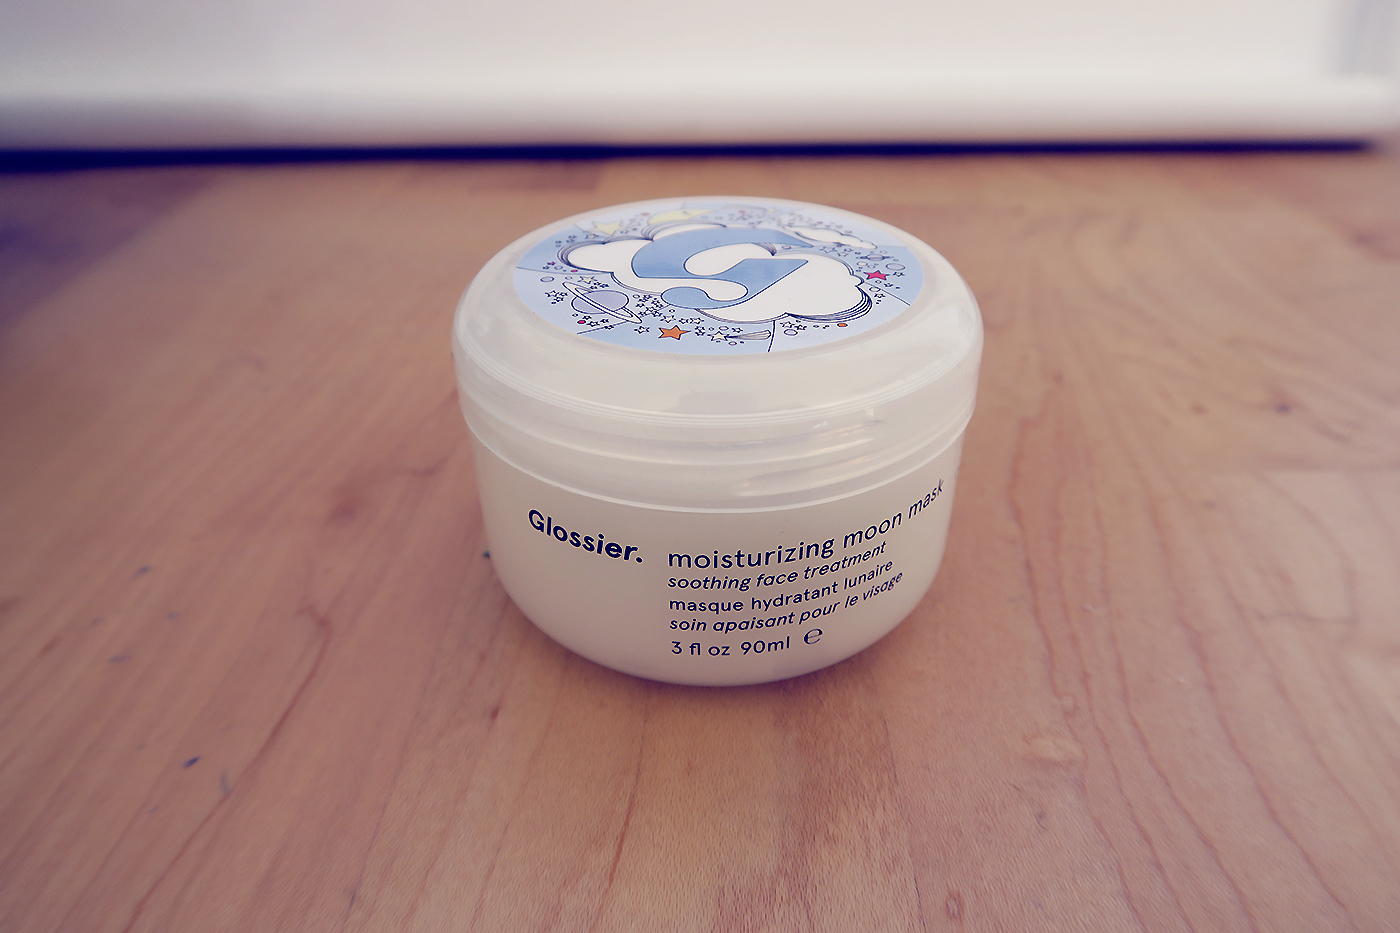 glossier moisturising moon mask